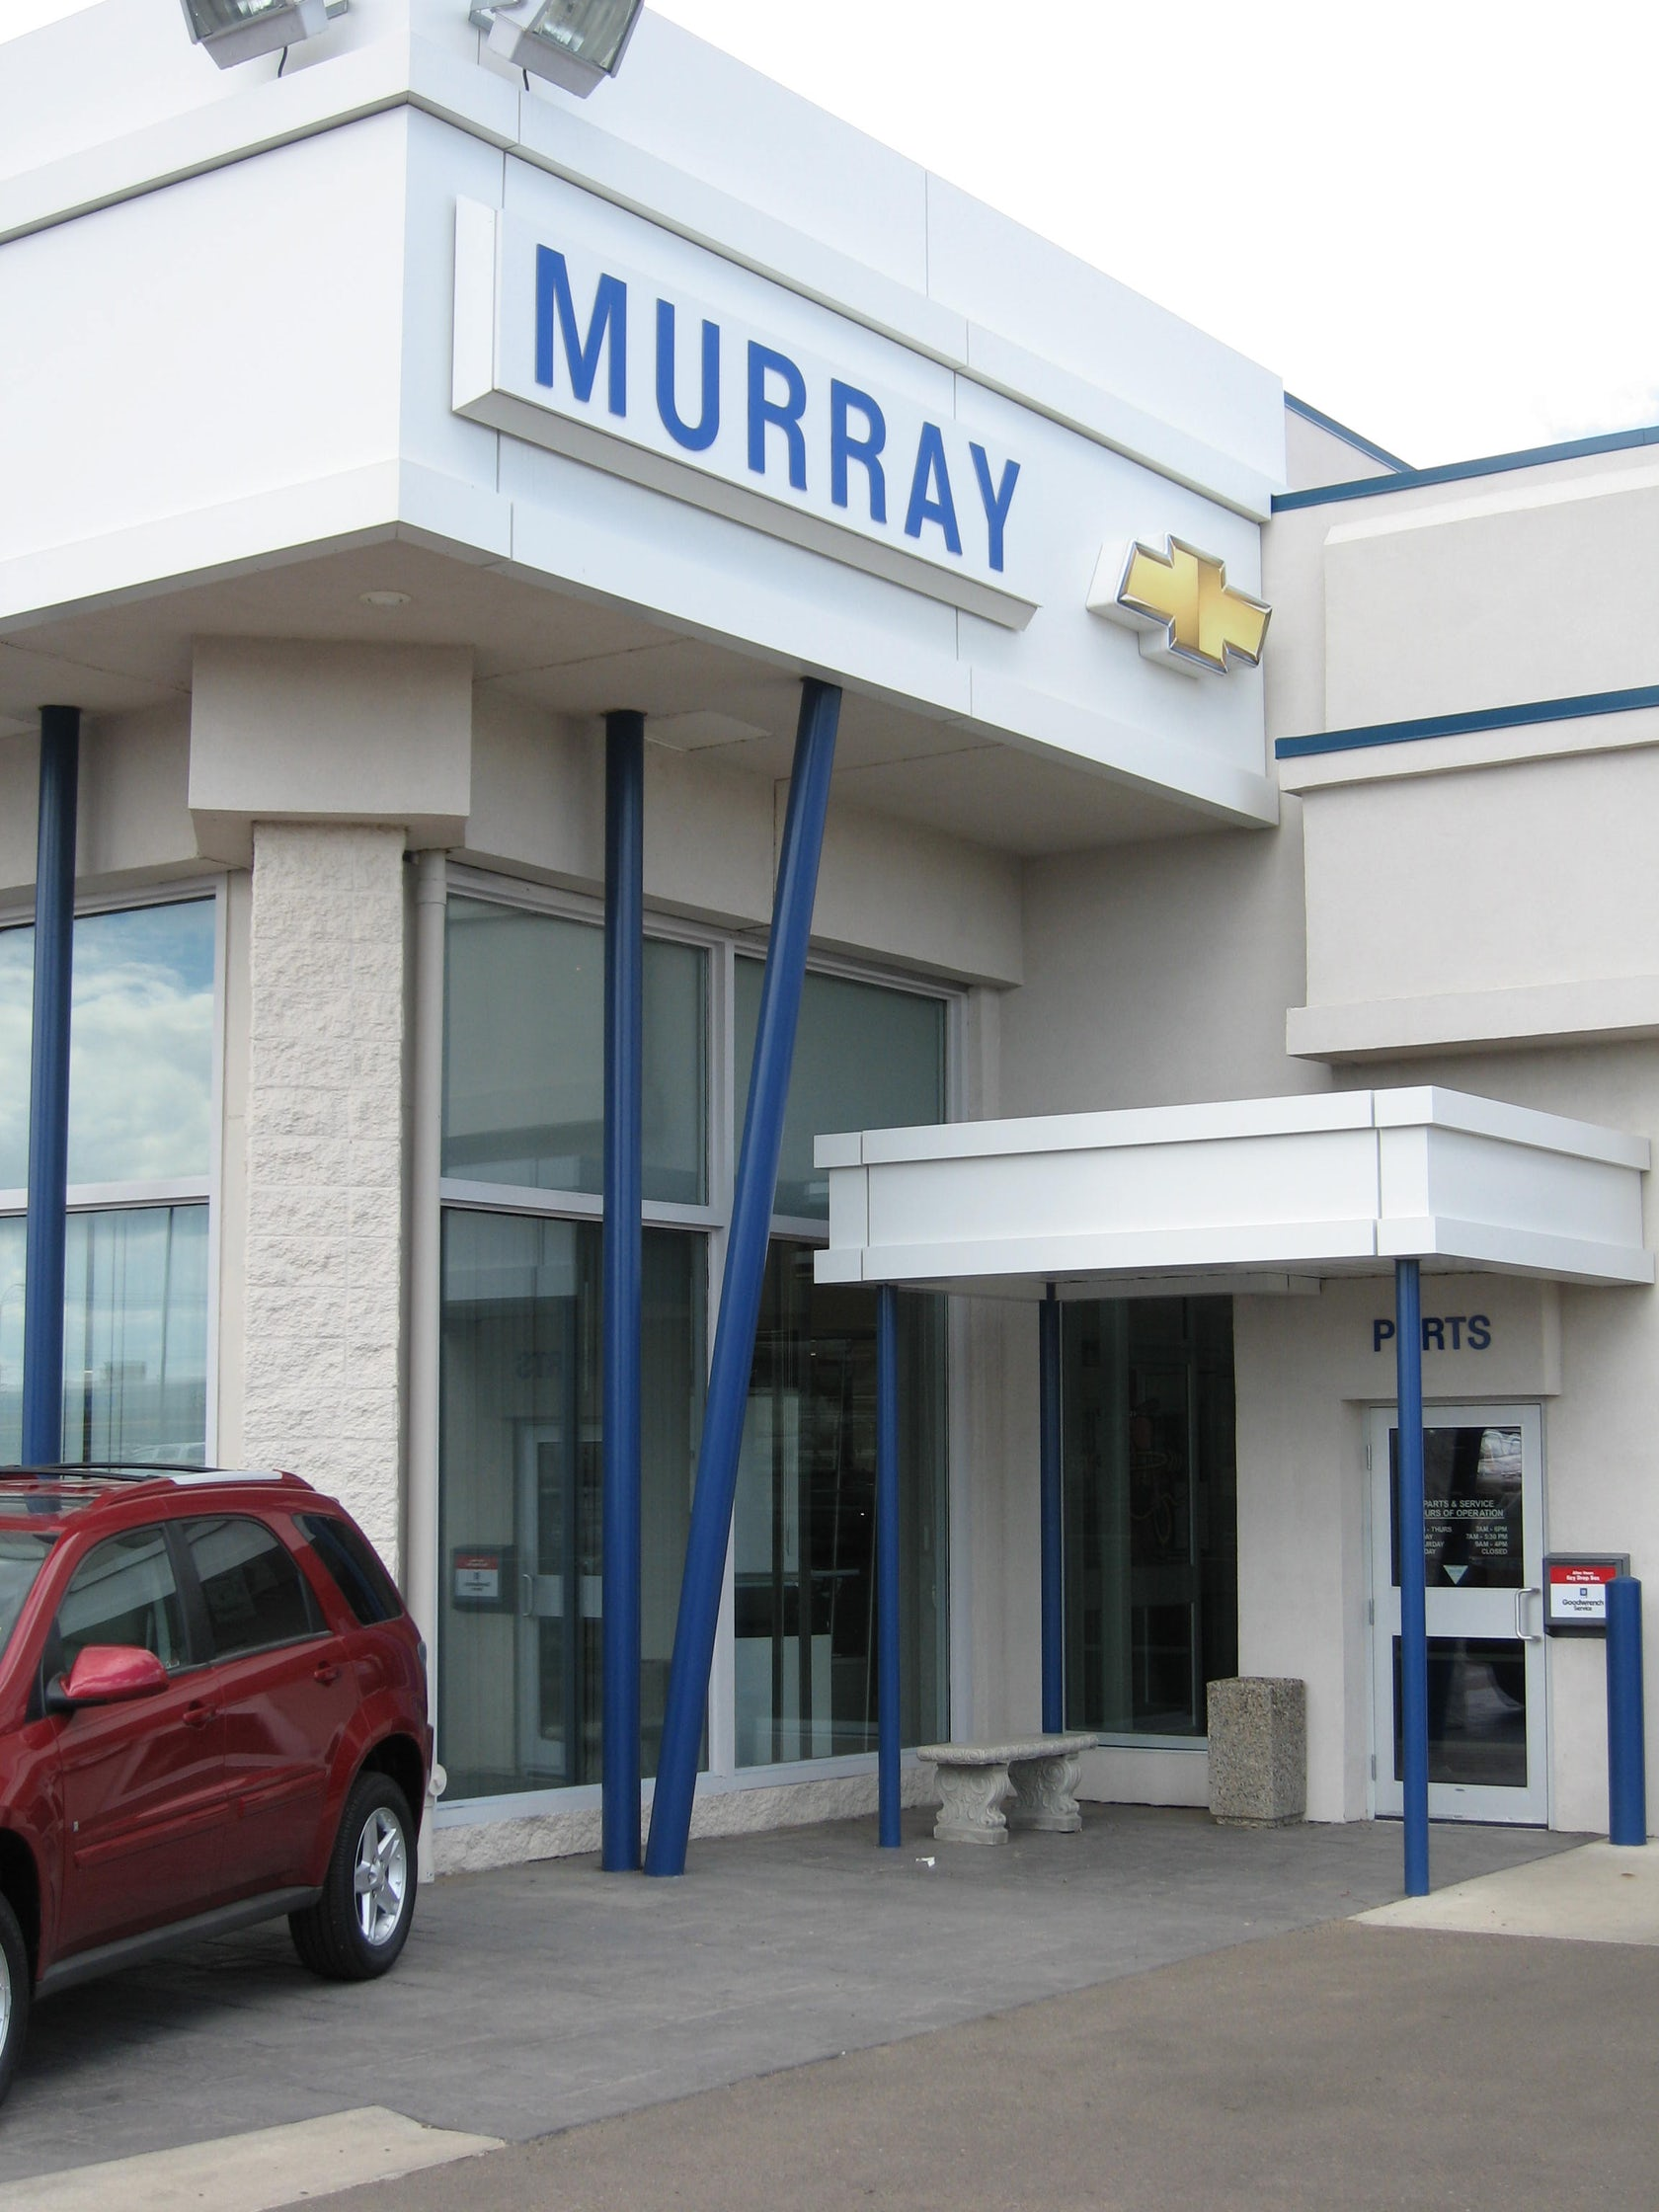 Murray Chevrolet & Cadillac Dealership Renovation - Architizer